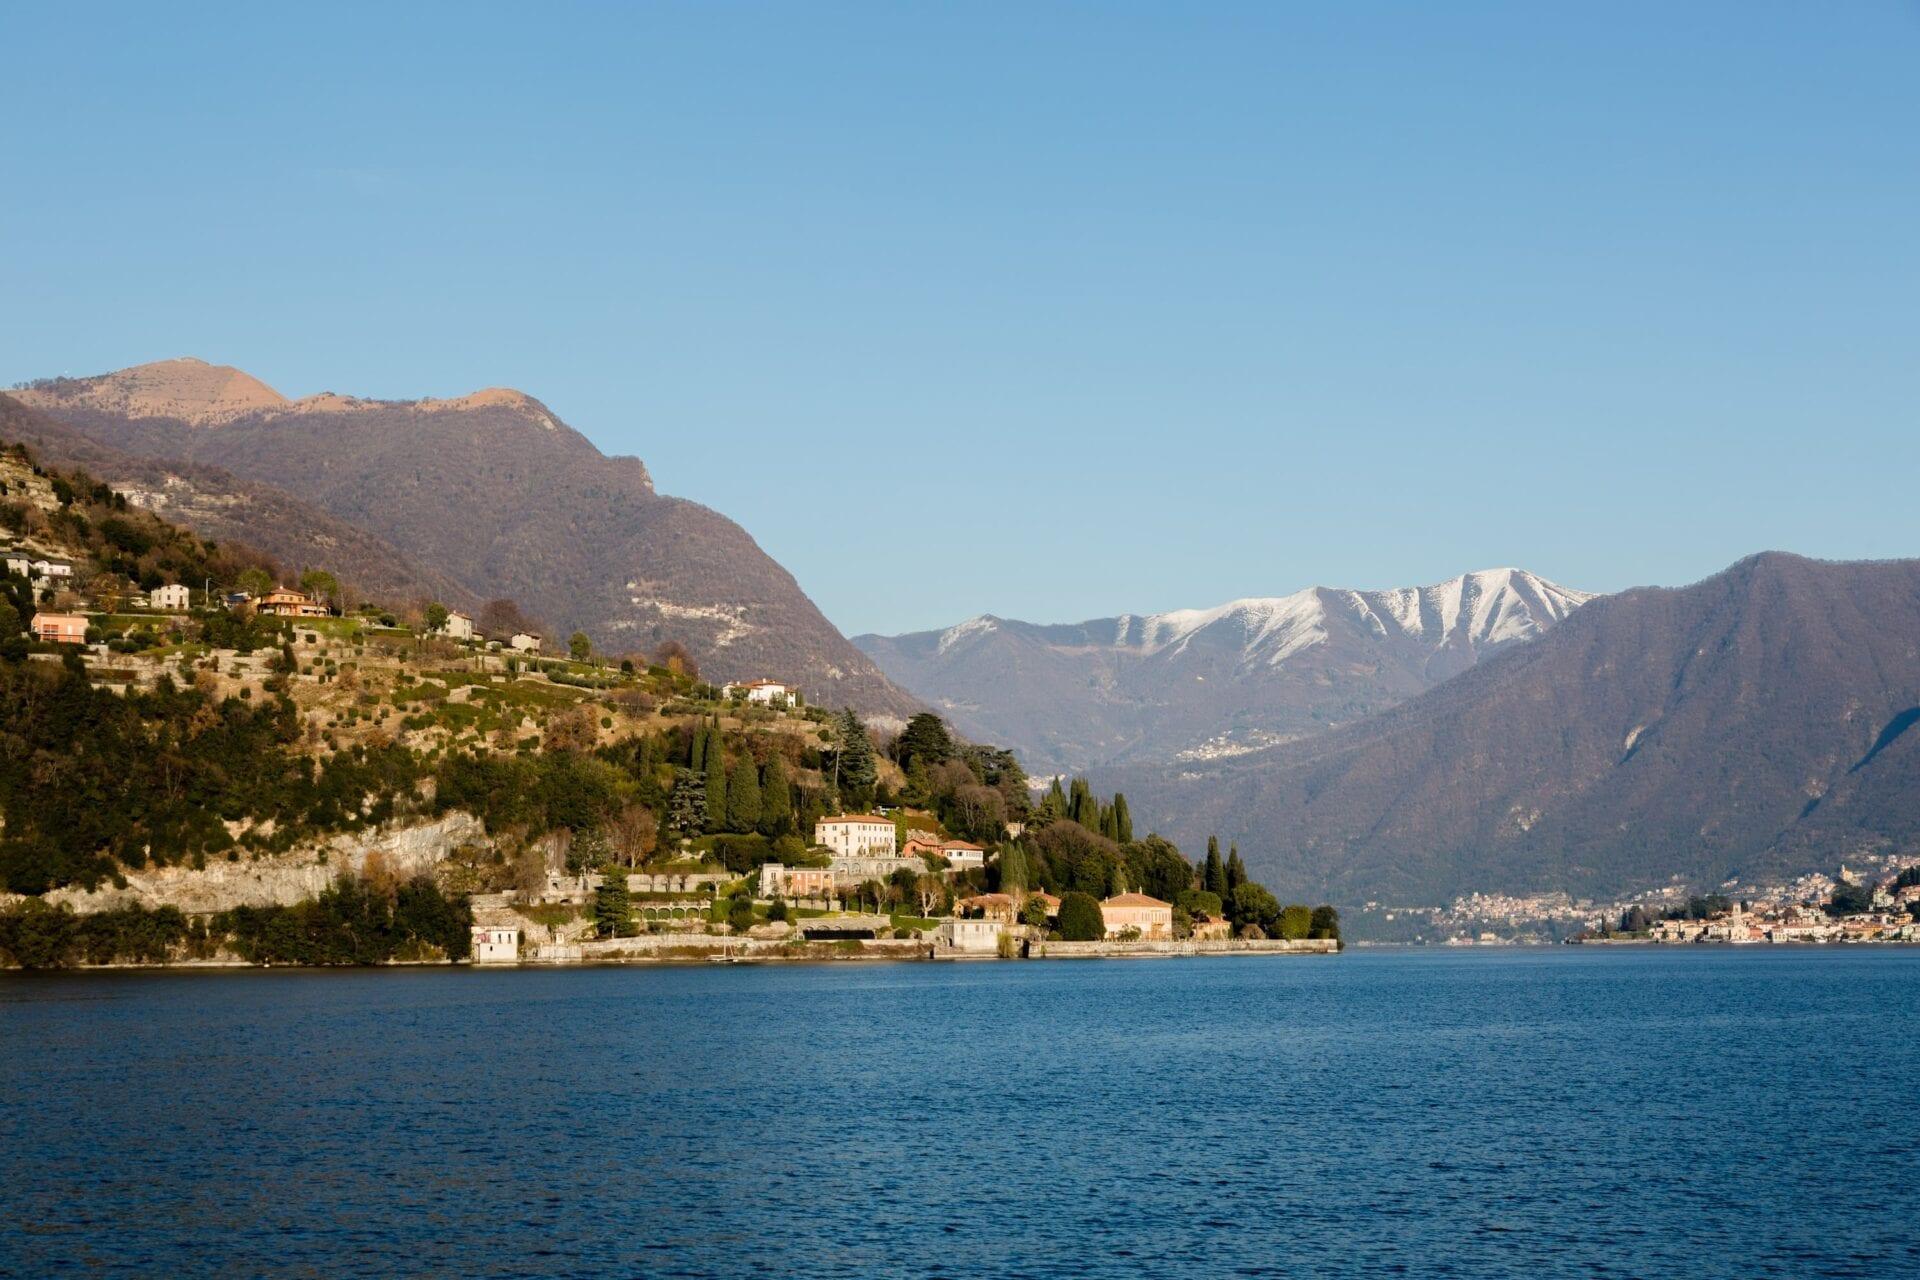 Matrimonio Lago Toscana : Matrimonio lago di como e garda sposarsi con bianco bouquet